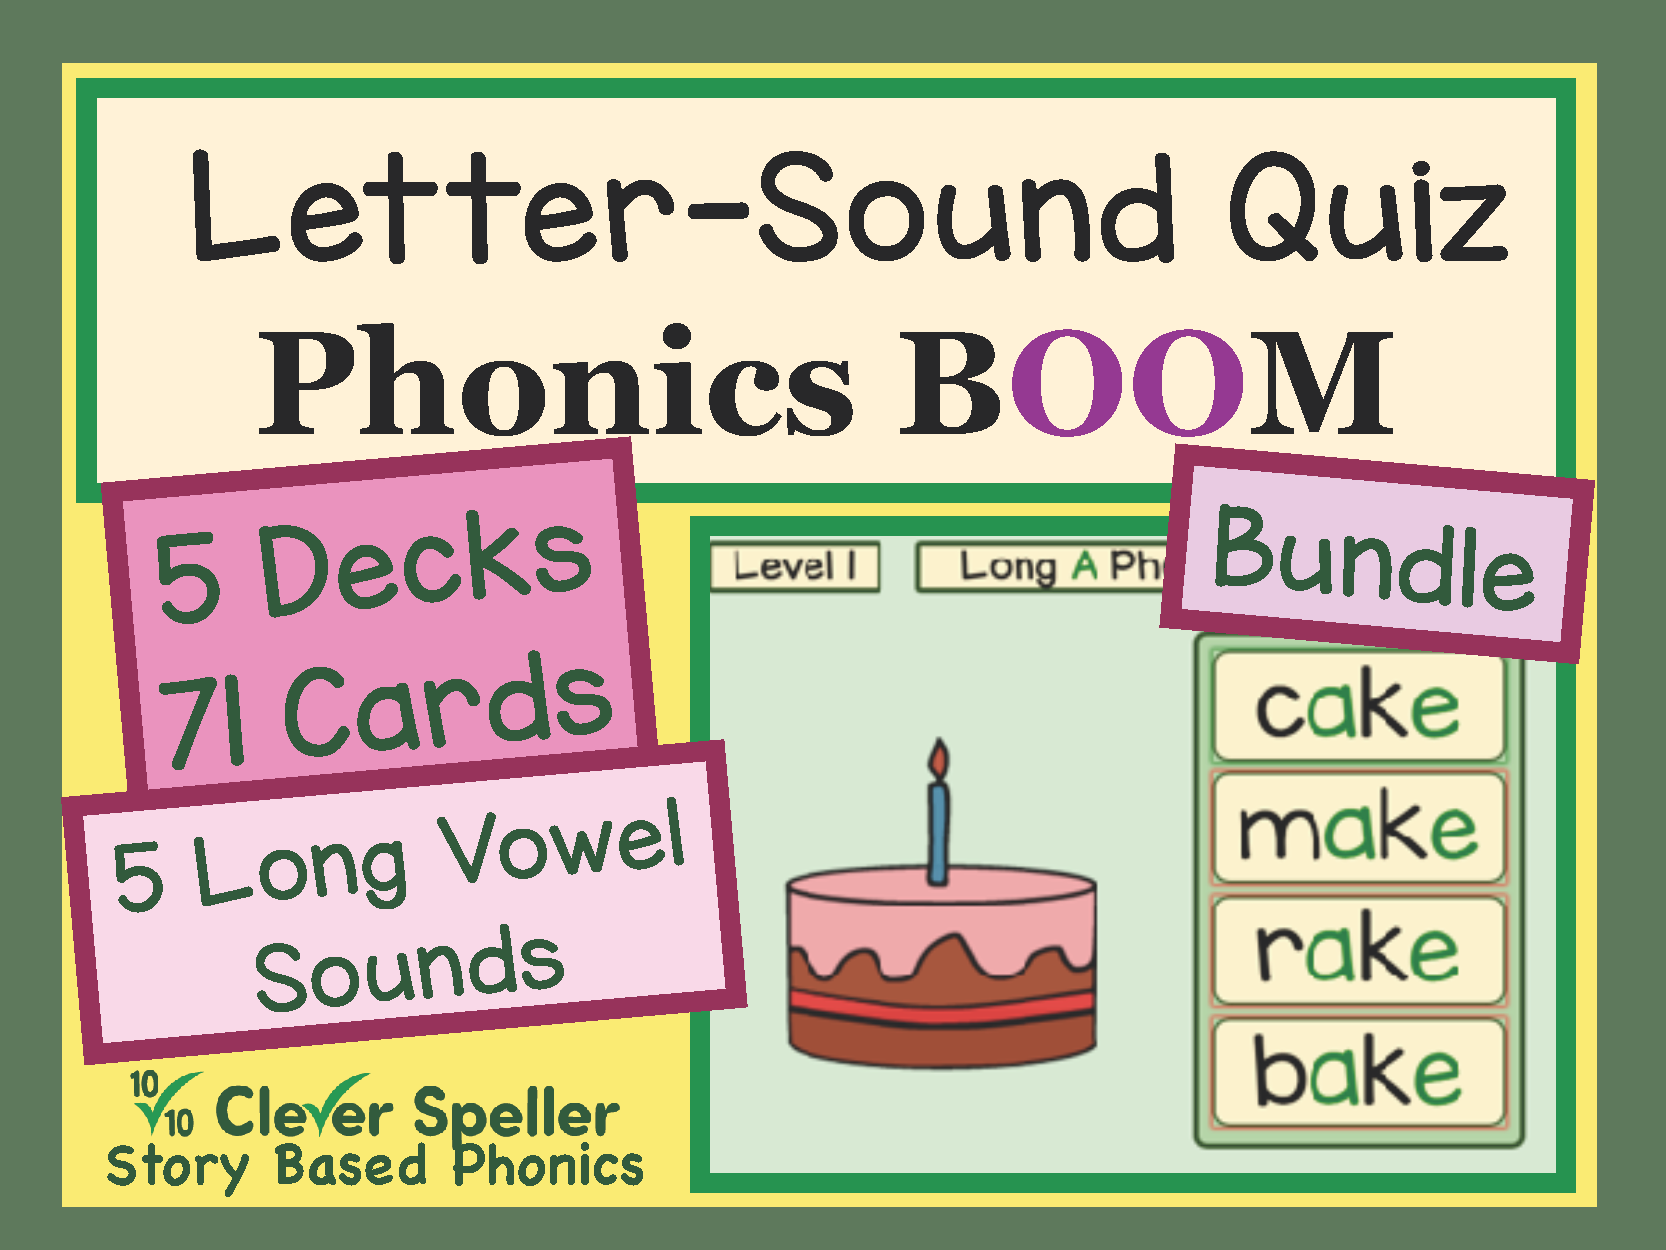 Phonics Practice Boom Cards Long Vowel Sounds Level 1